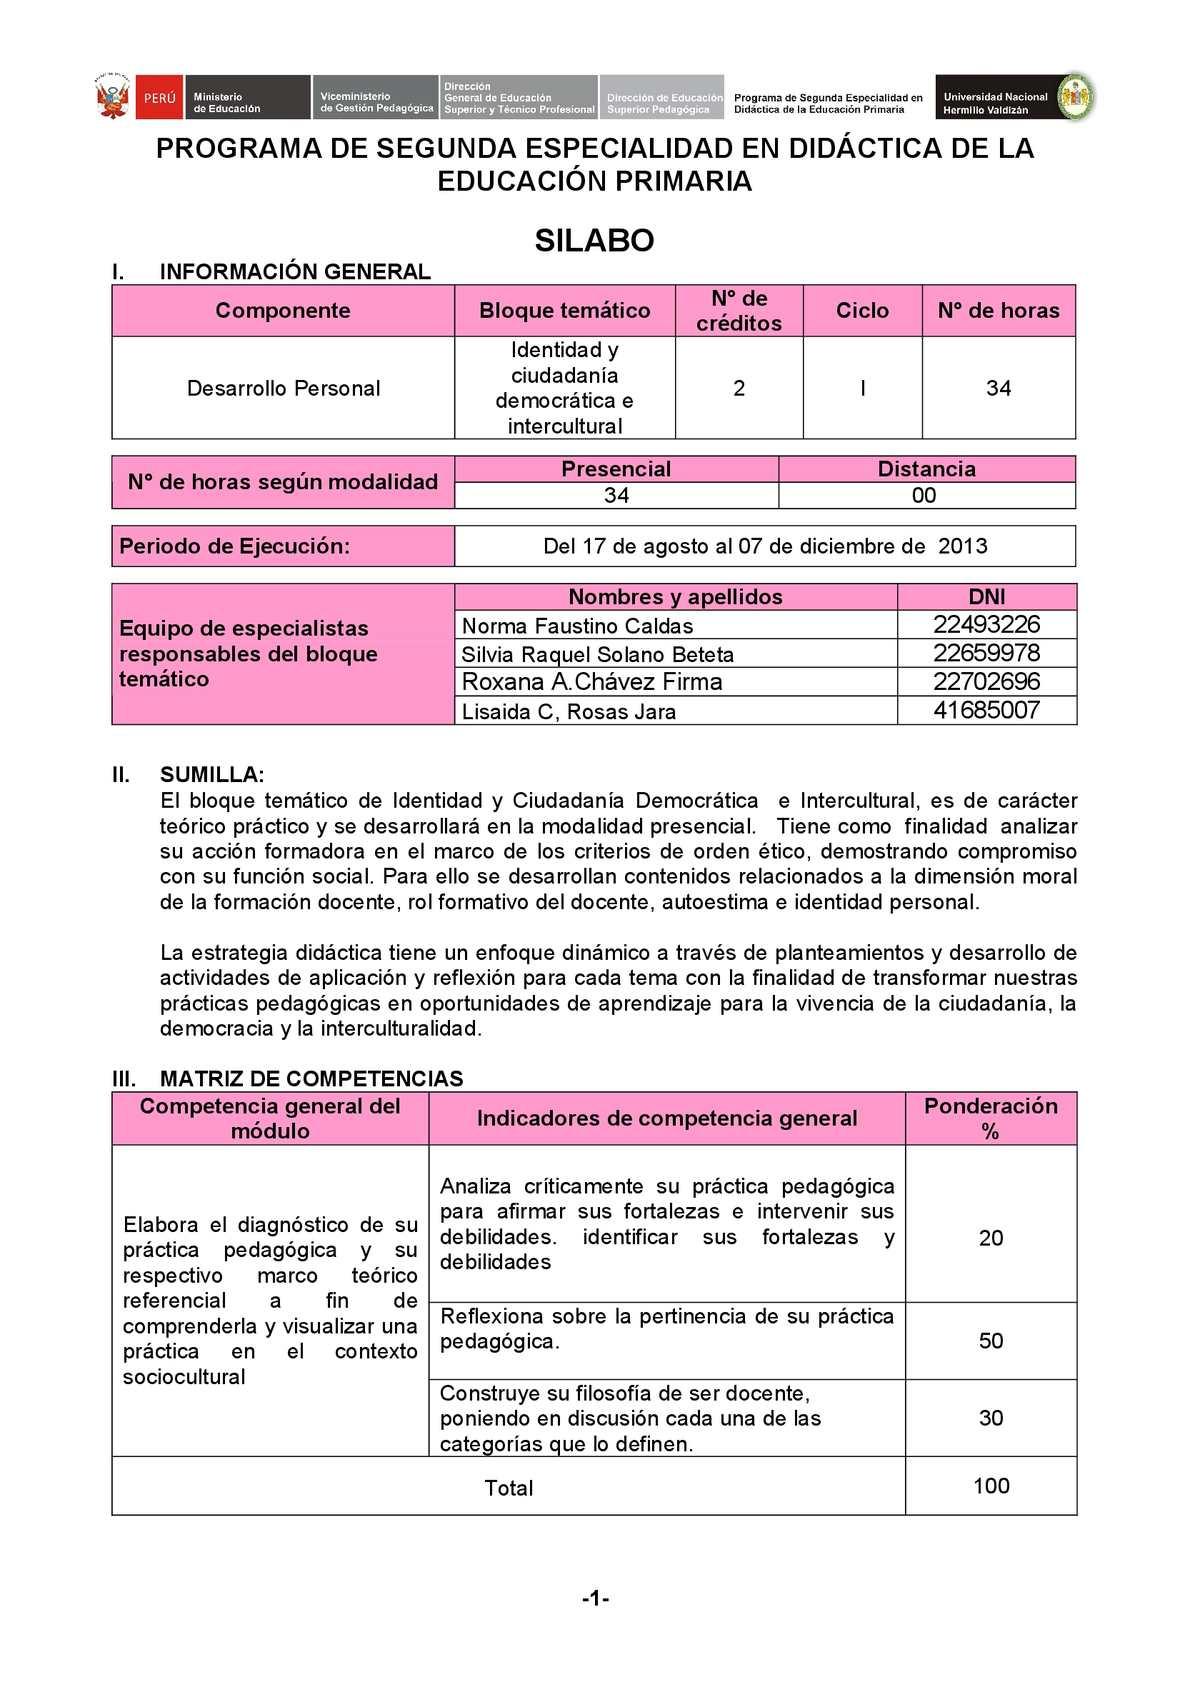 Calaméo - SILABO BLOQUE TEMATICO CIUDADANIA